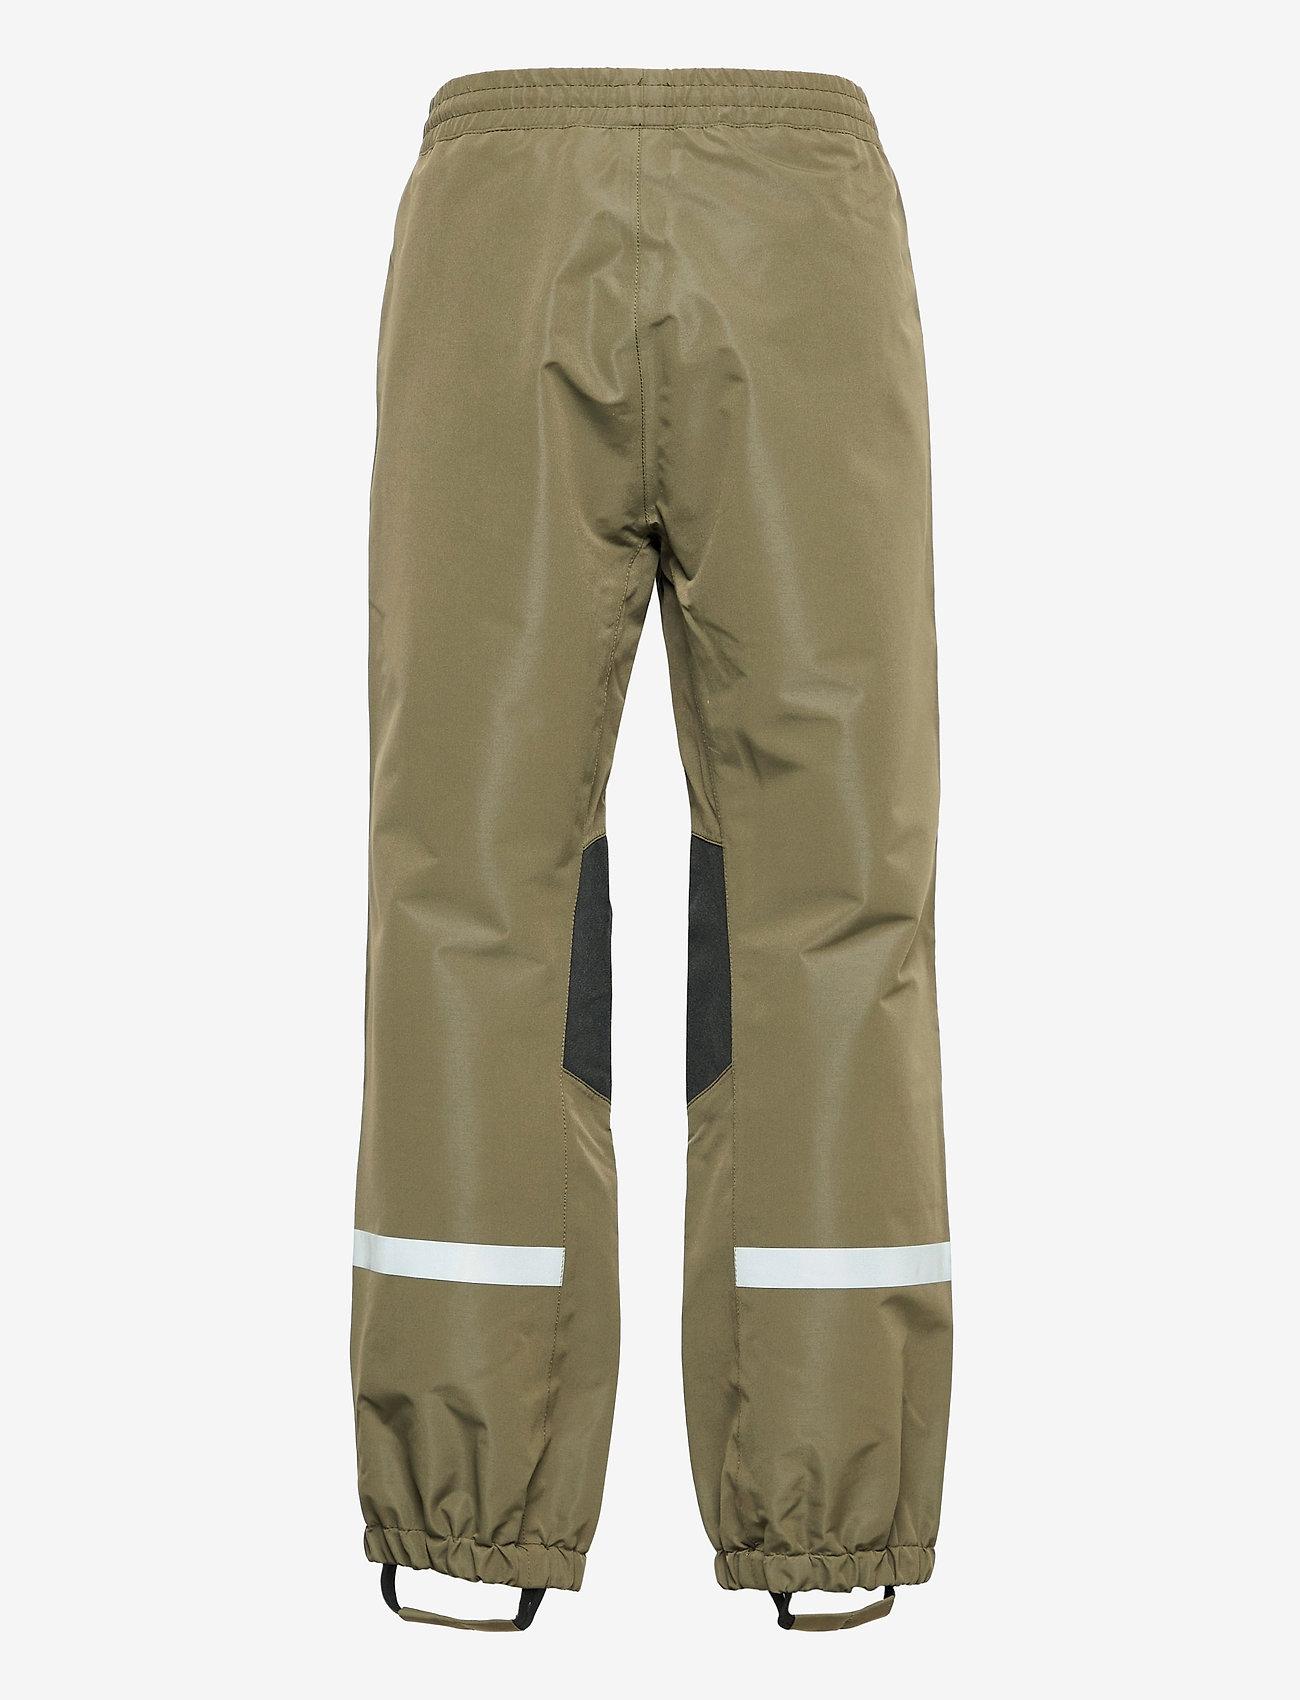 Tenson - Shore pants jr - shell- & regenbroeken - khaki - 1